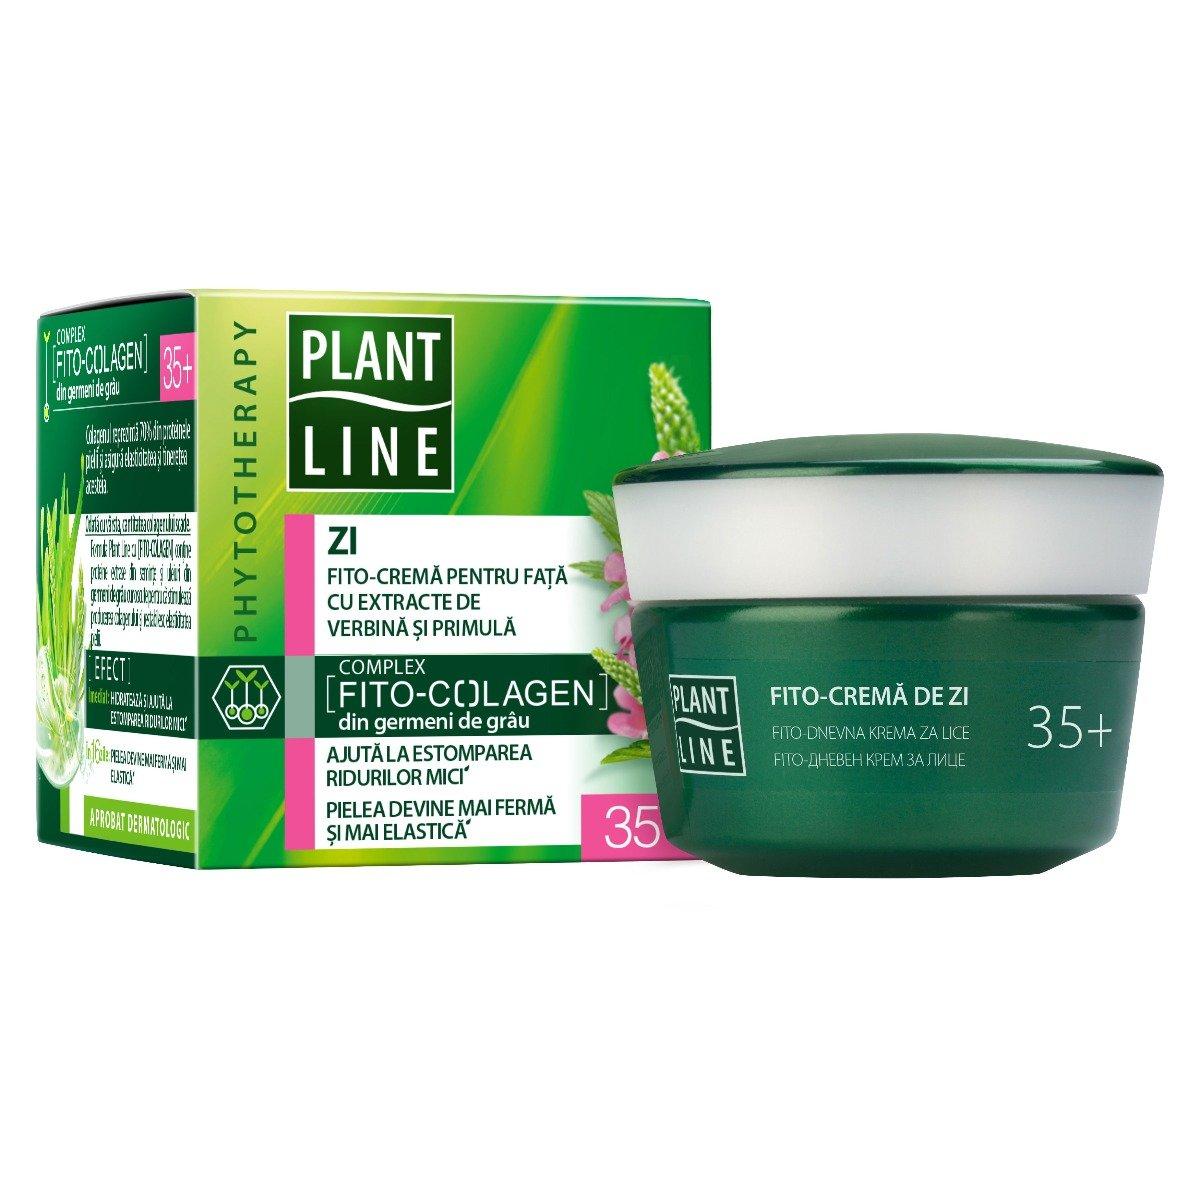 Crema de zi Plant Line Verbina, 35+, 45 ml imagine